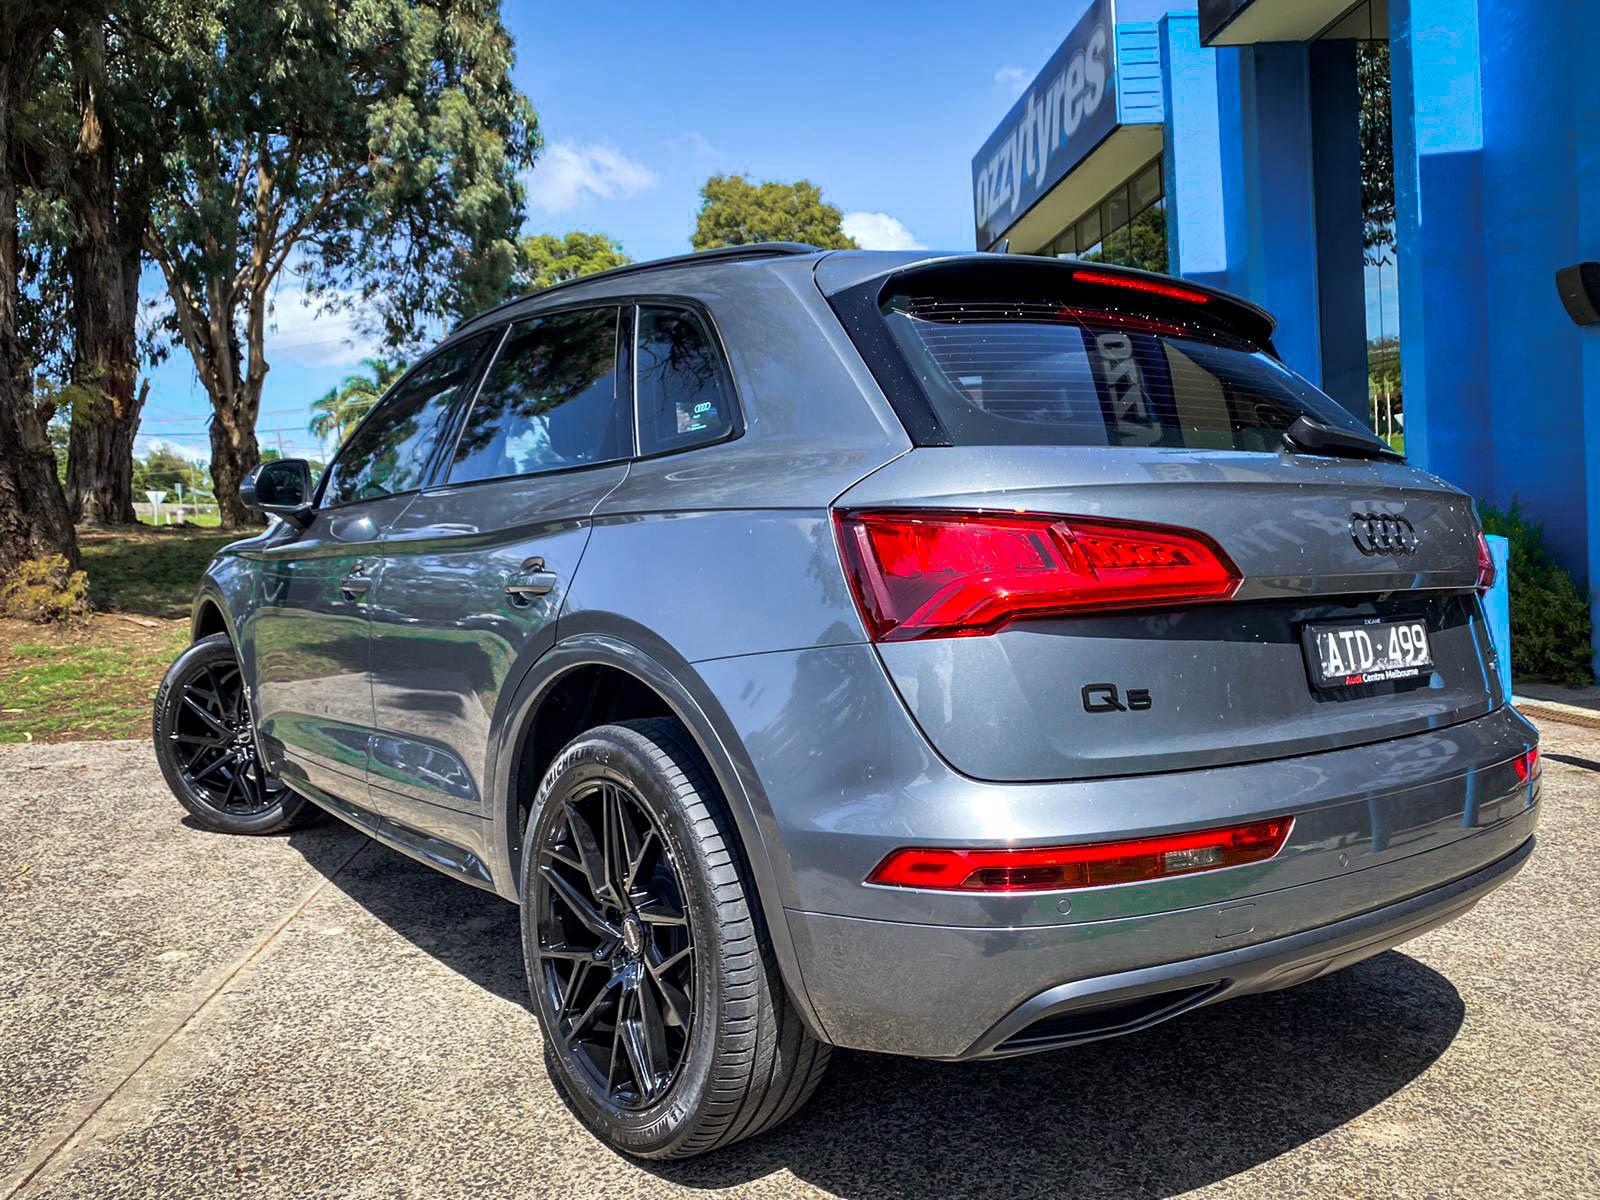 Audi Q5 on hussla jacques gloss black 3 of 4